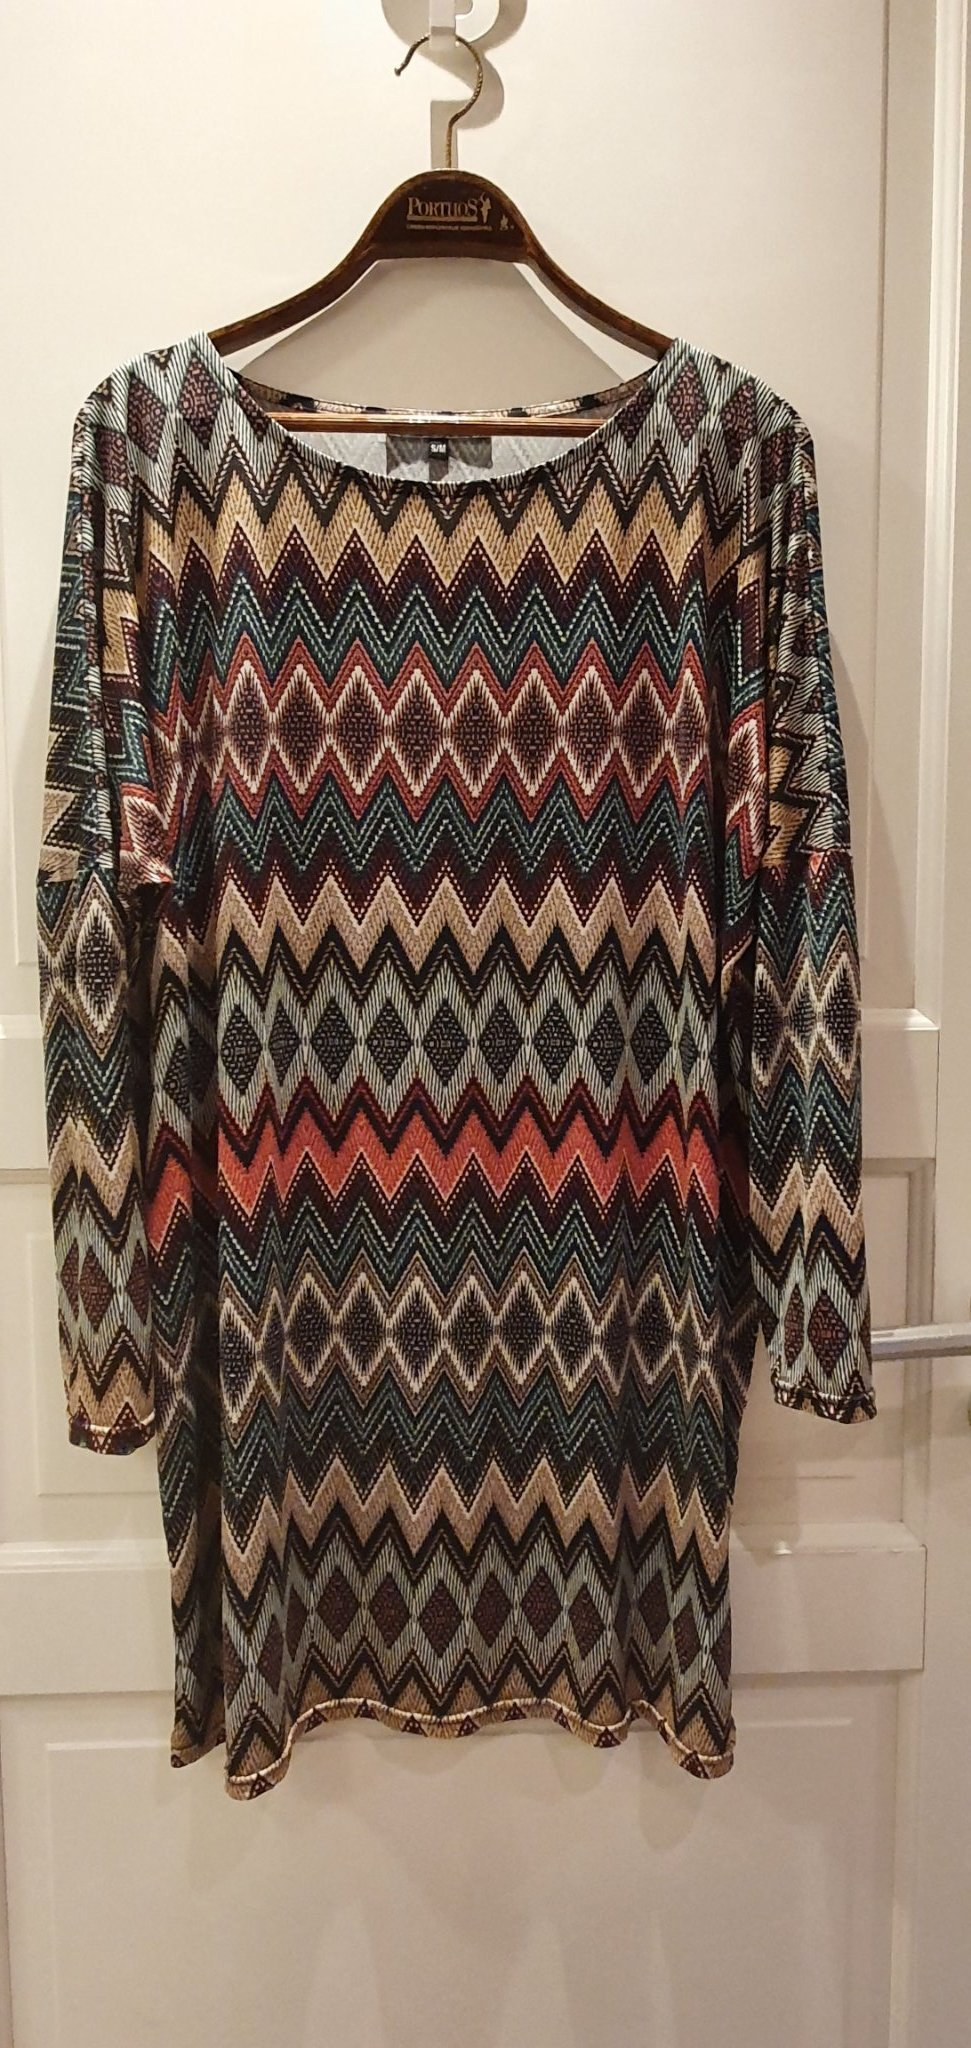 Ilse Jacobsen tröja storlek SM flerfärgad i fint skick